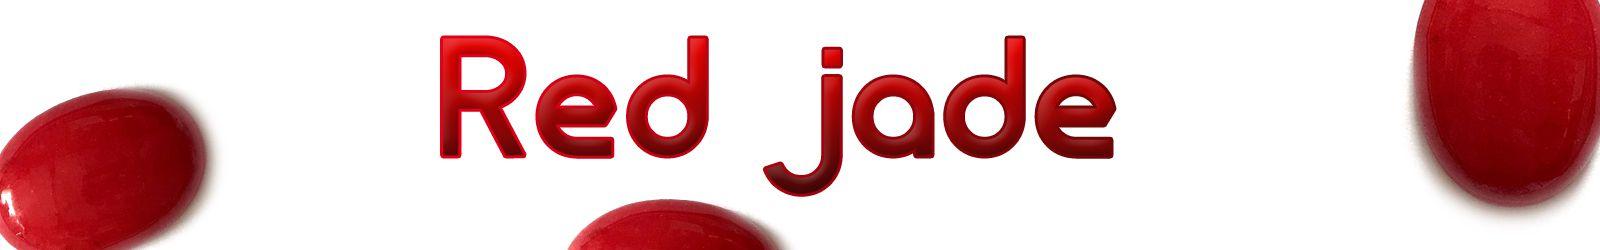 Red jade stone